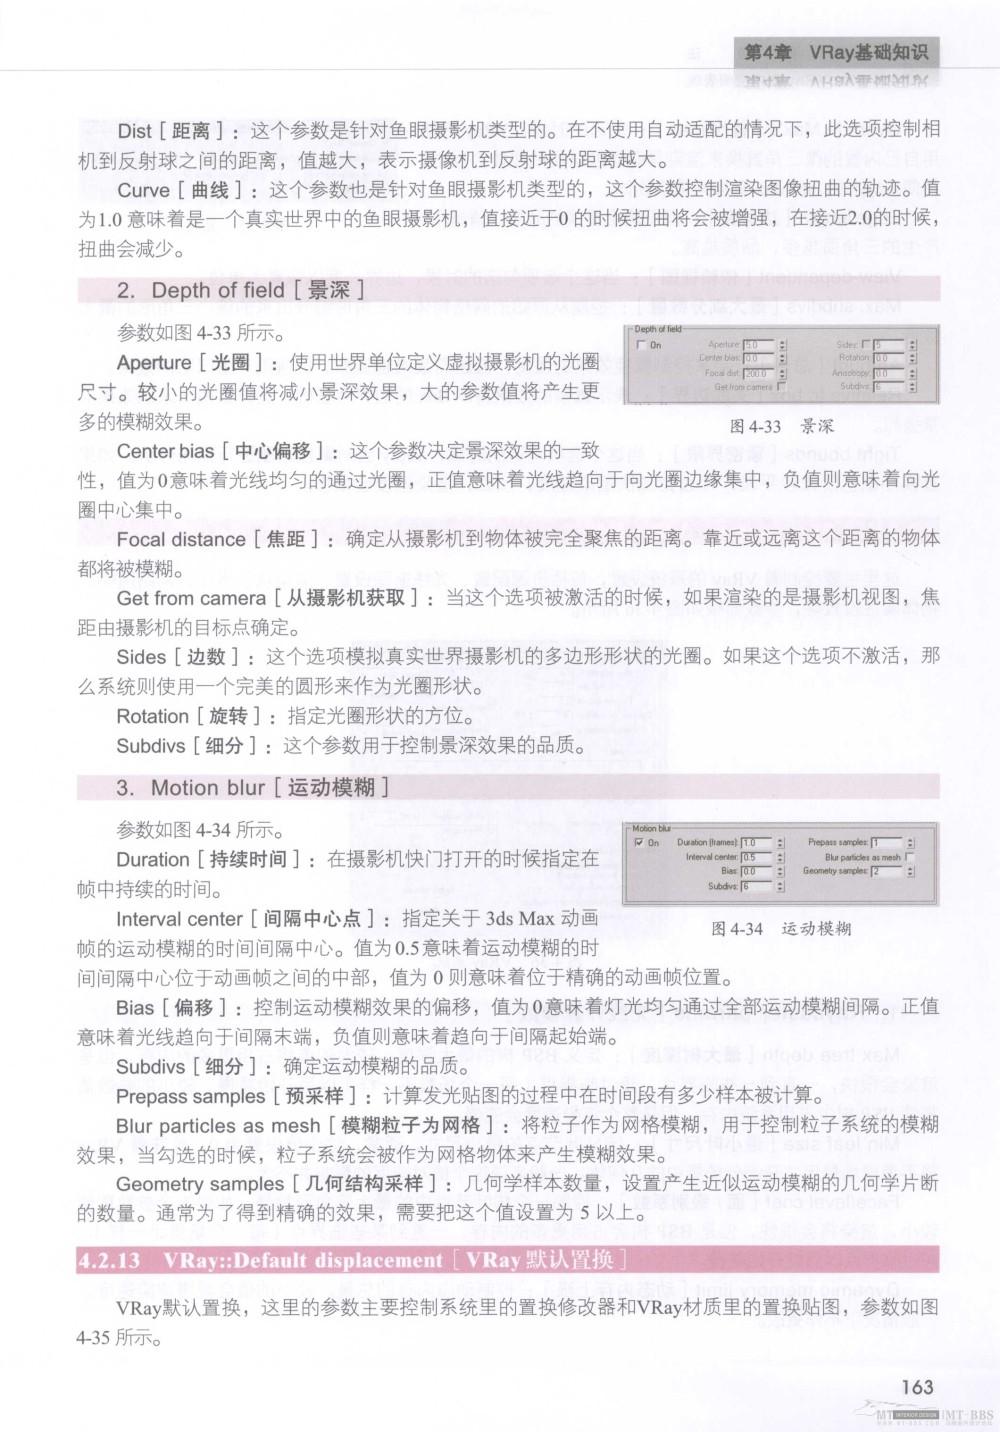 水晶石技法-3ds_Max&VRay室内空间表现_水晶石技法-3ds_Max&VRay室内空间表现_页面_169.jpg